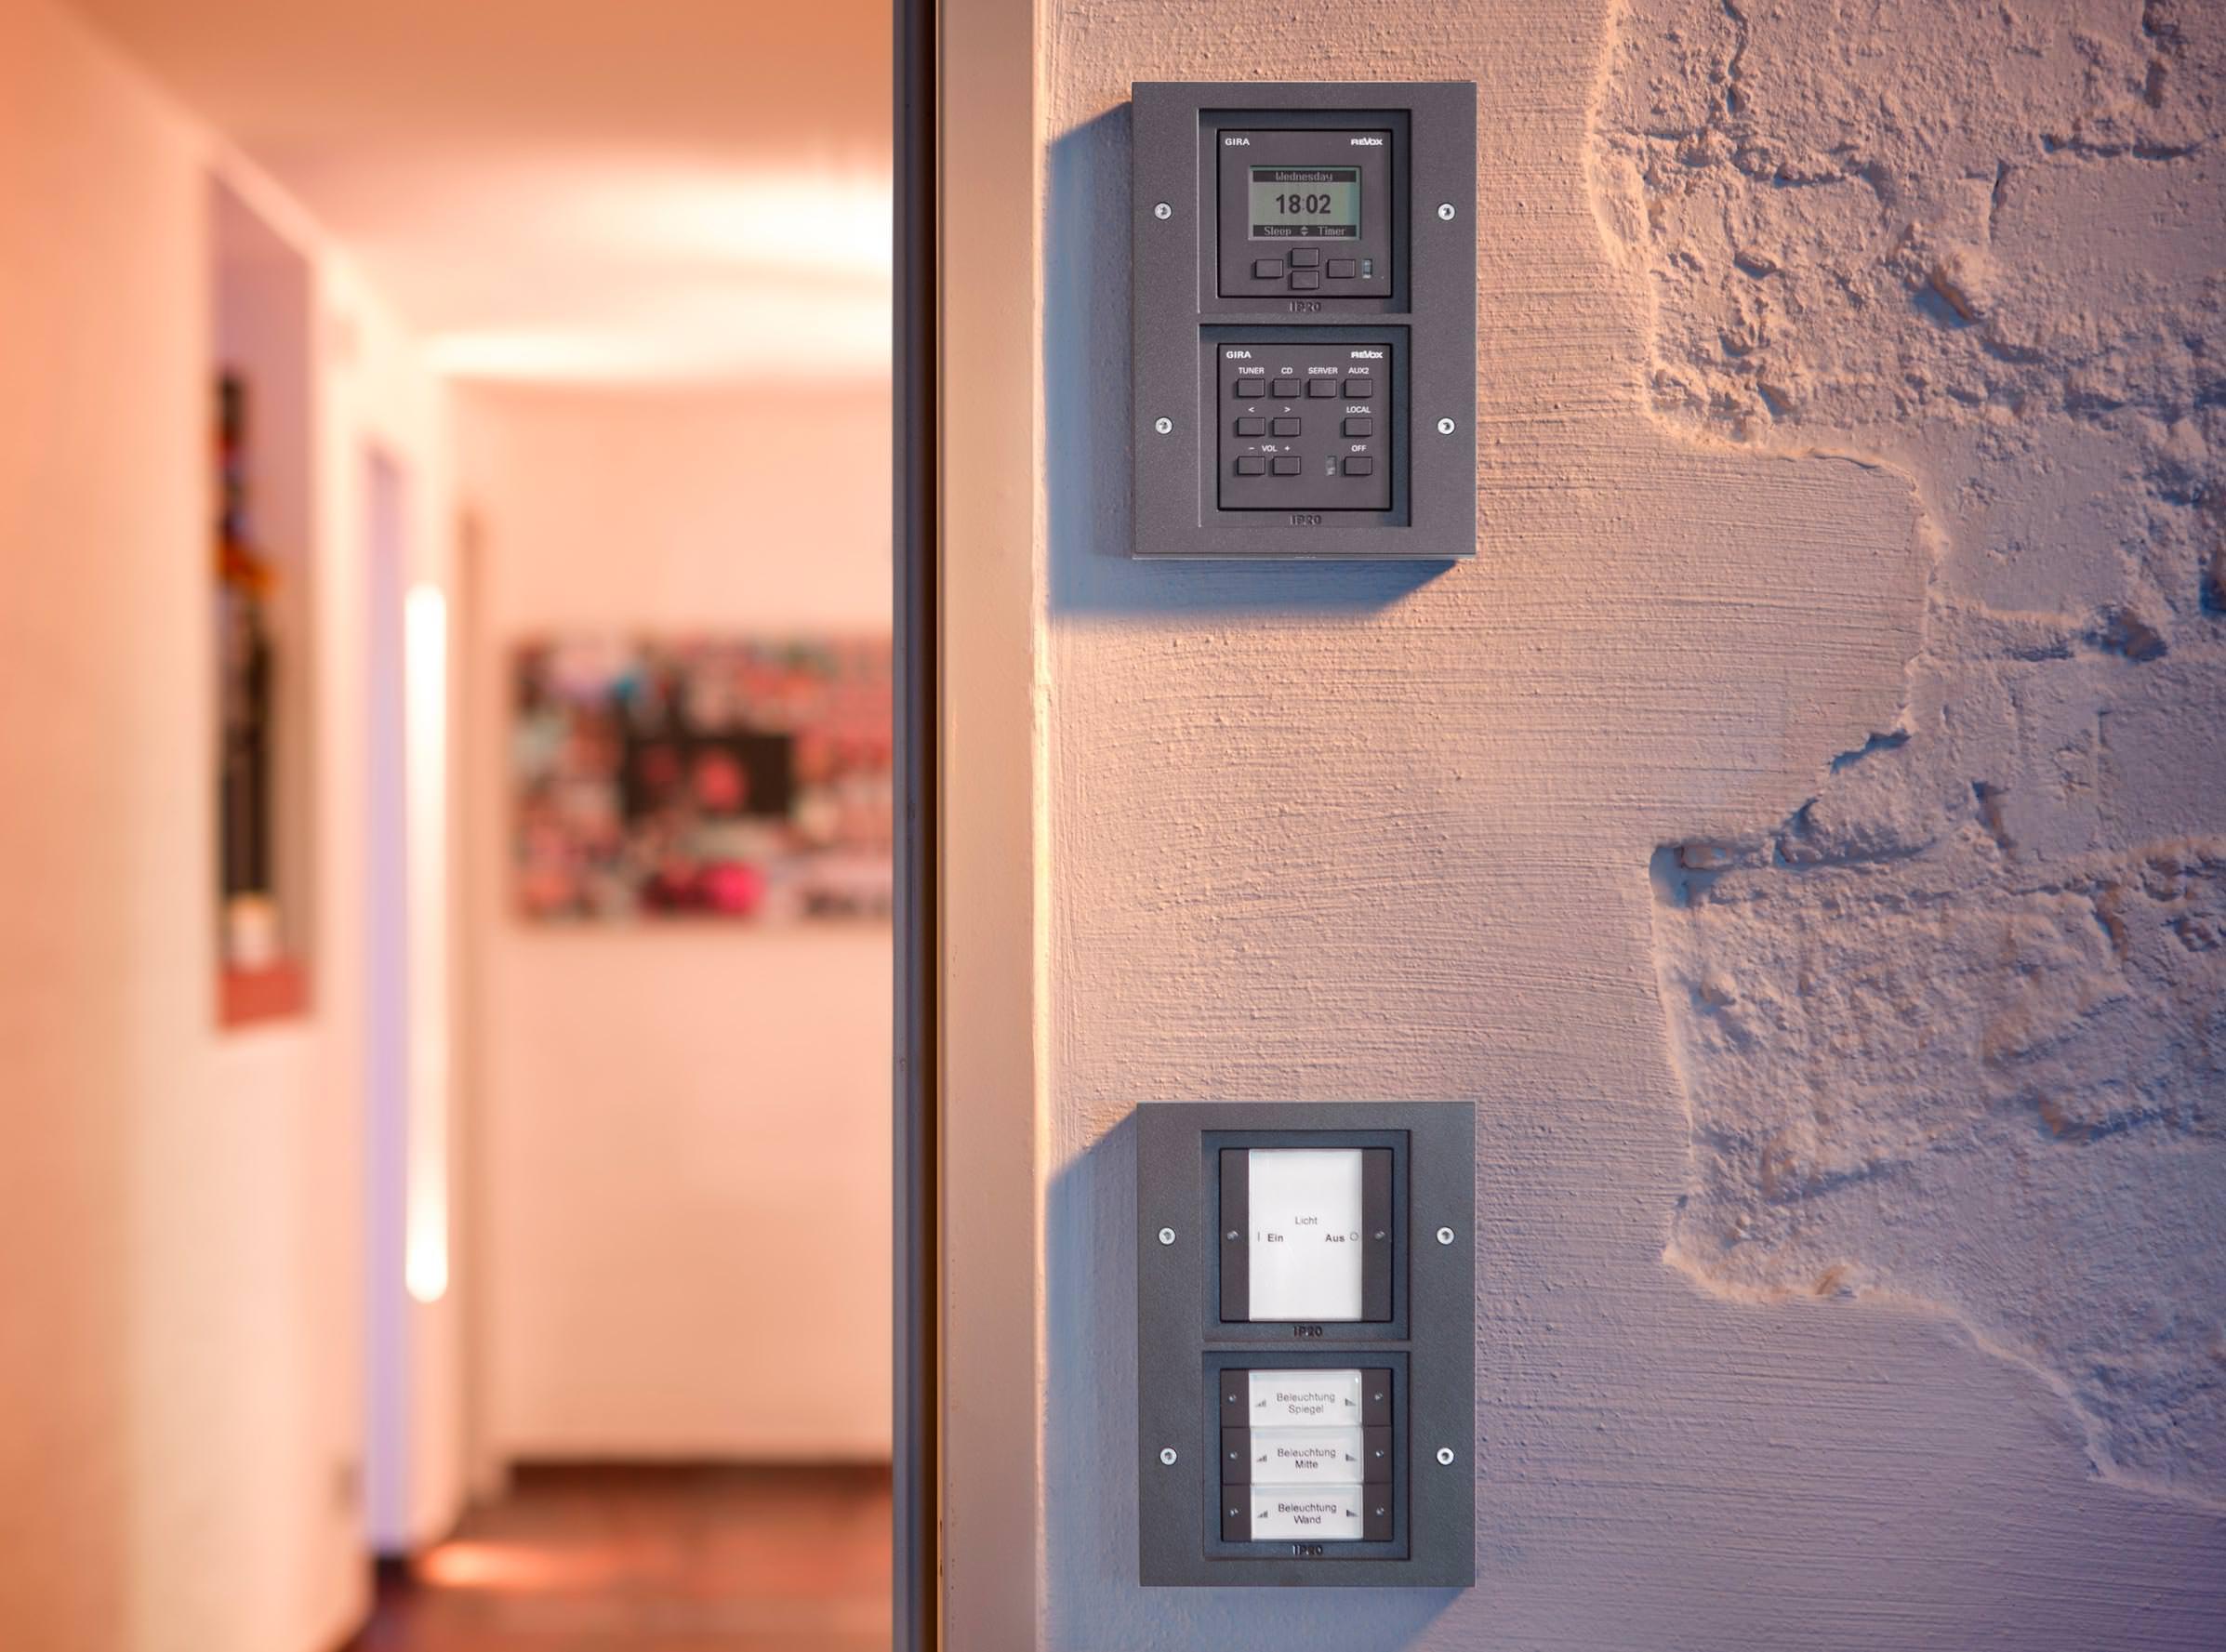 gira tx 44 funktionales schalterprogramm mit. Black Bedroom Furniture Sets. Home Design Ideas